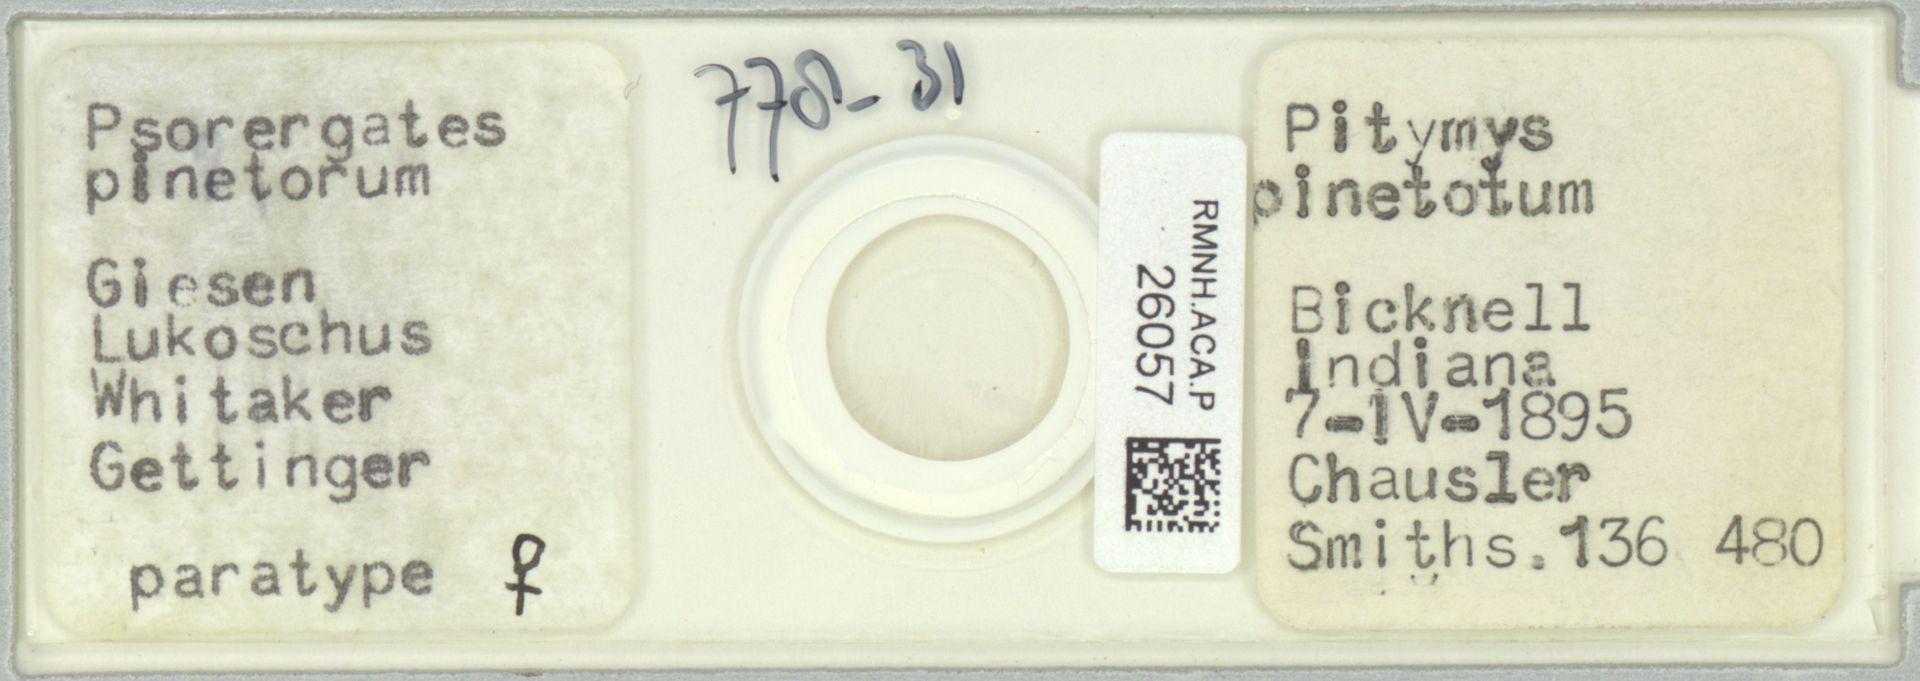 RMNH.ACA.P.26057 | Psorergates pinetorum Giesen Lukoschus Whitaker Gettinger